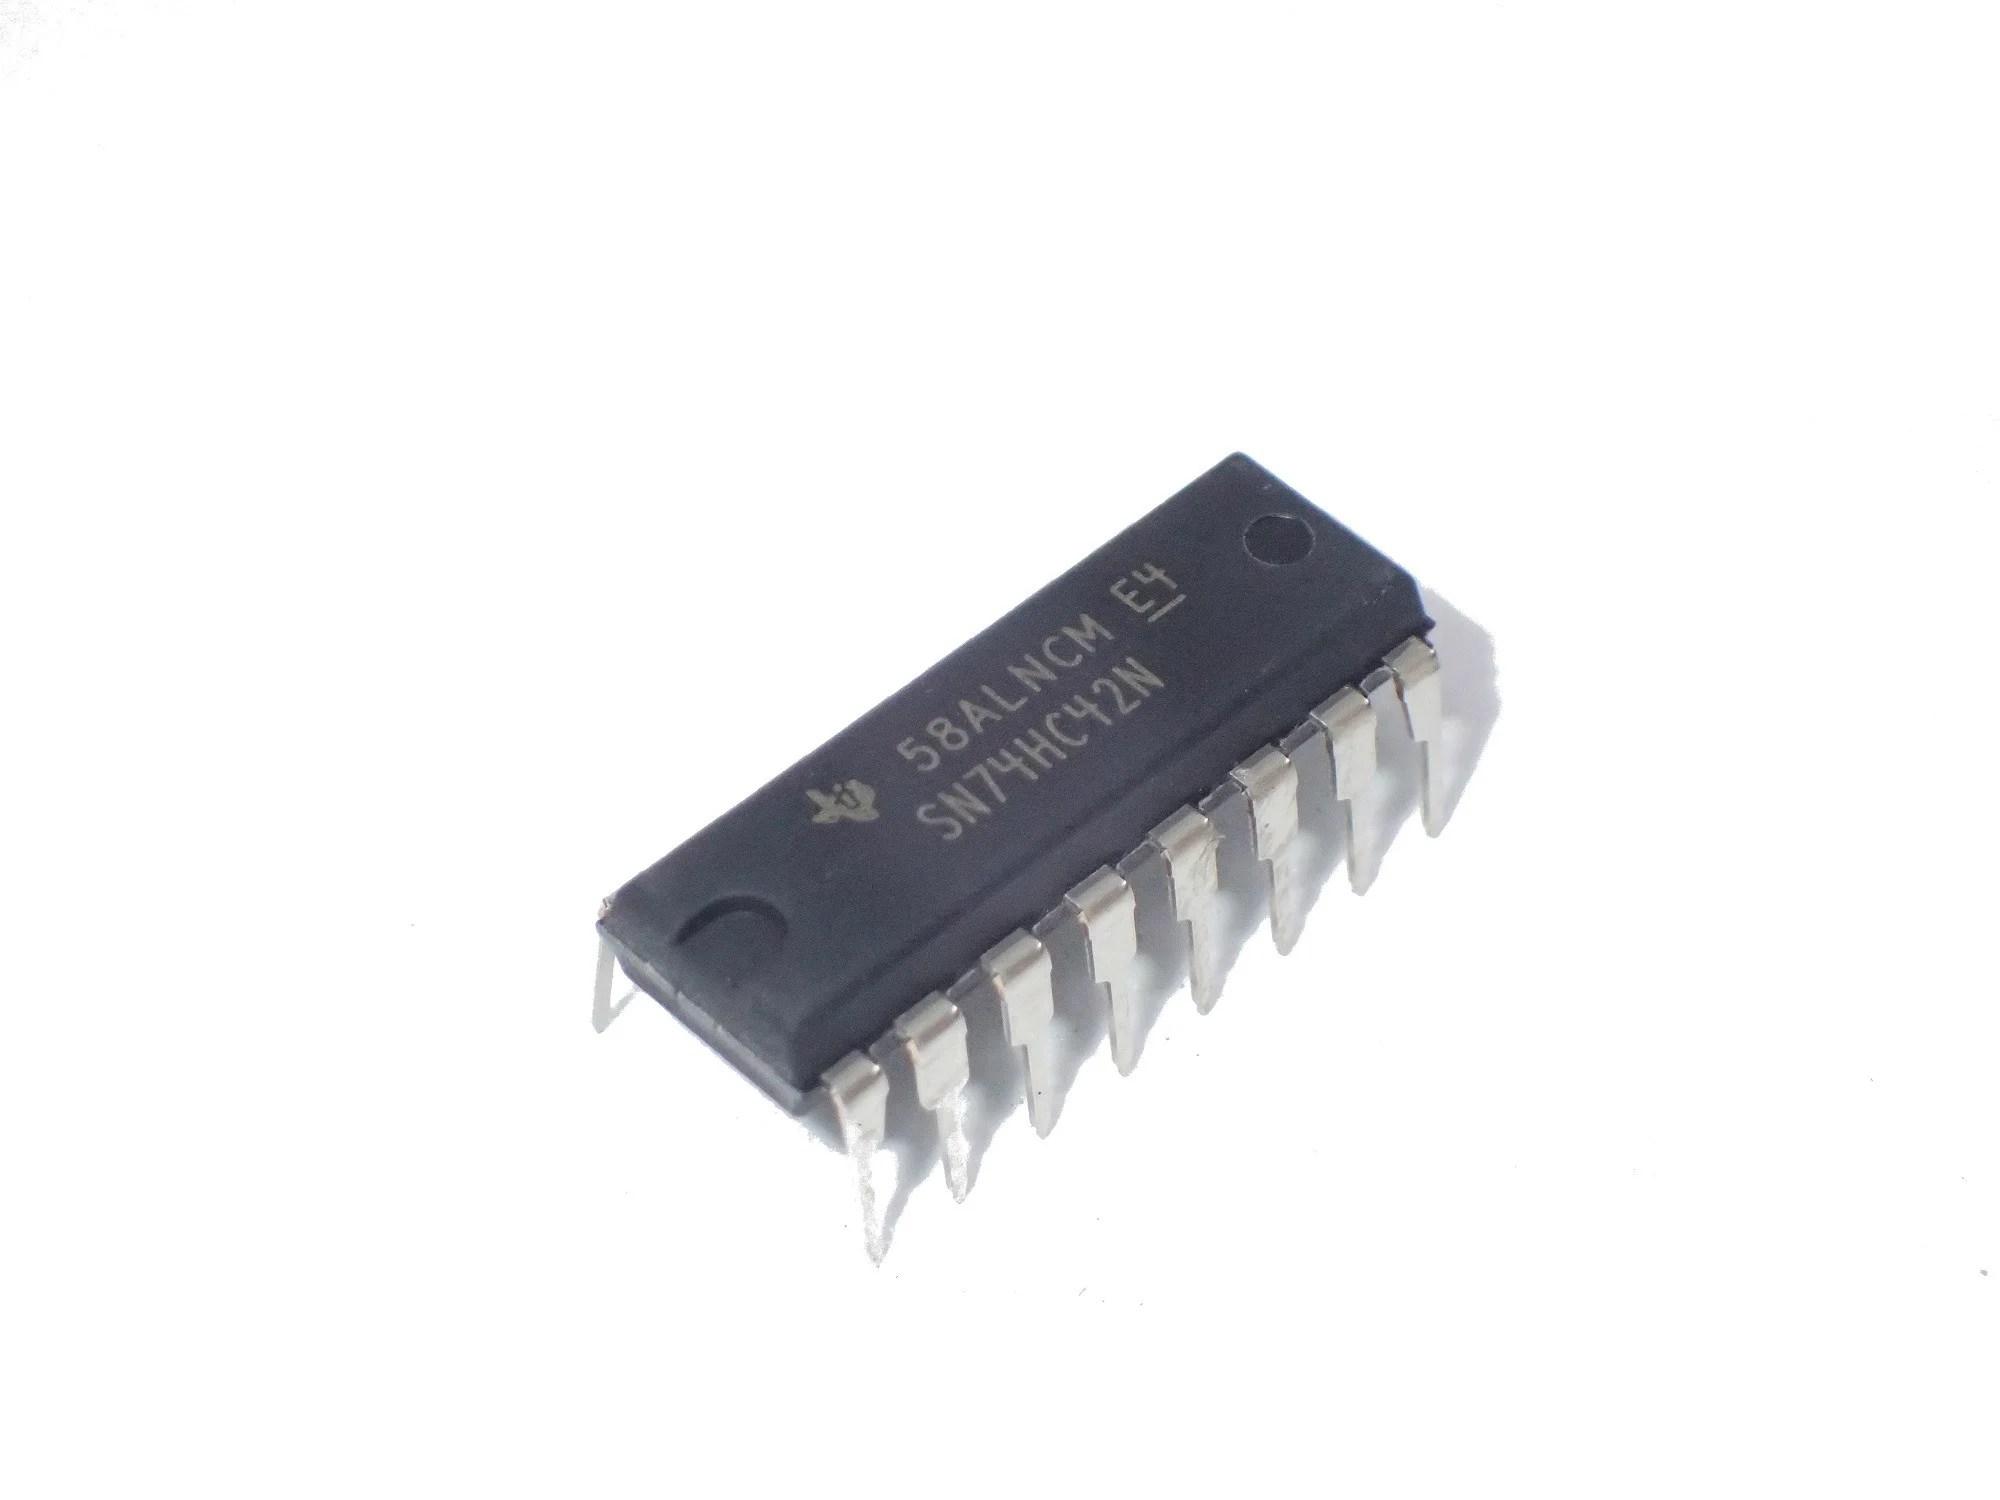 hight resolution of sn74hc42n bcd to decimal decoder 10 output 5 2 ma 2 v to 6 v dip 16 x 2pcs